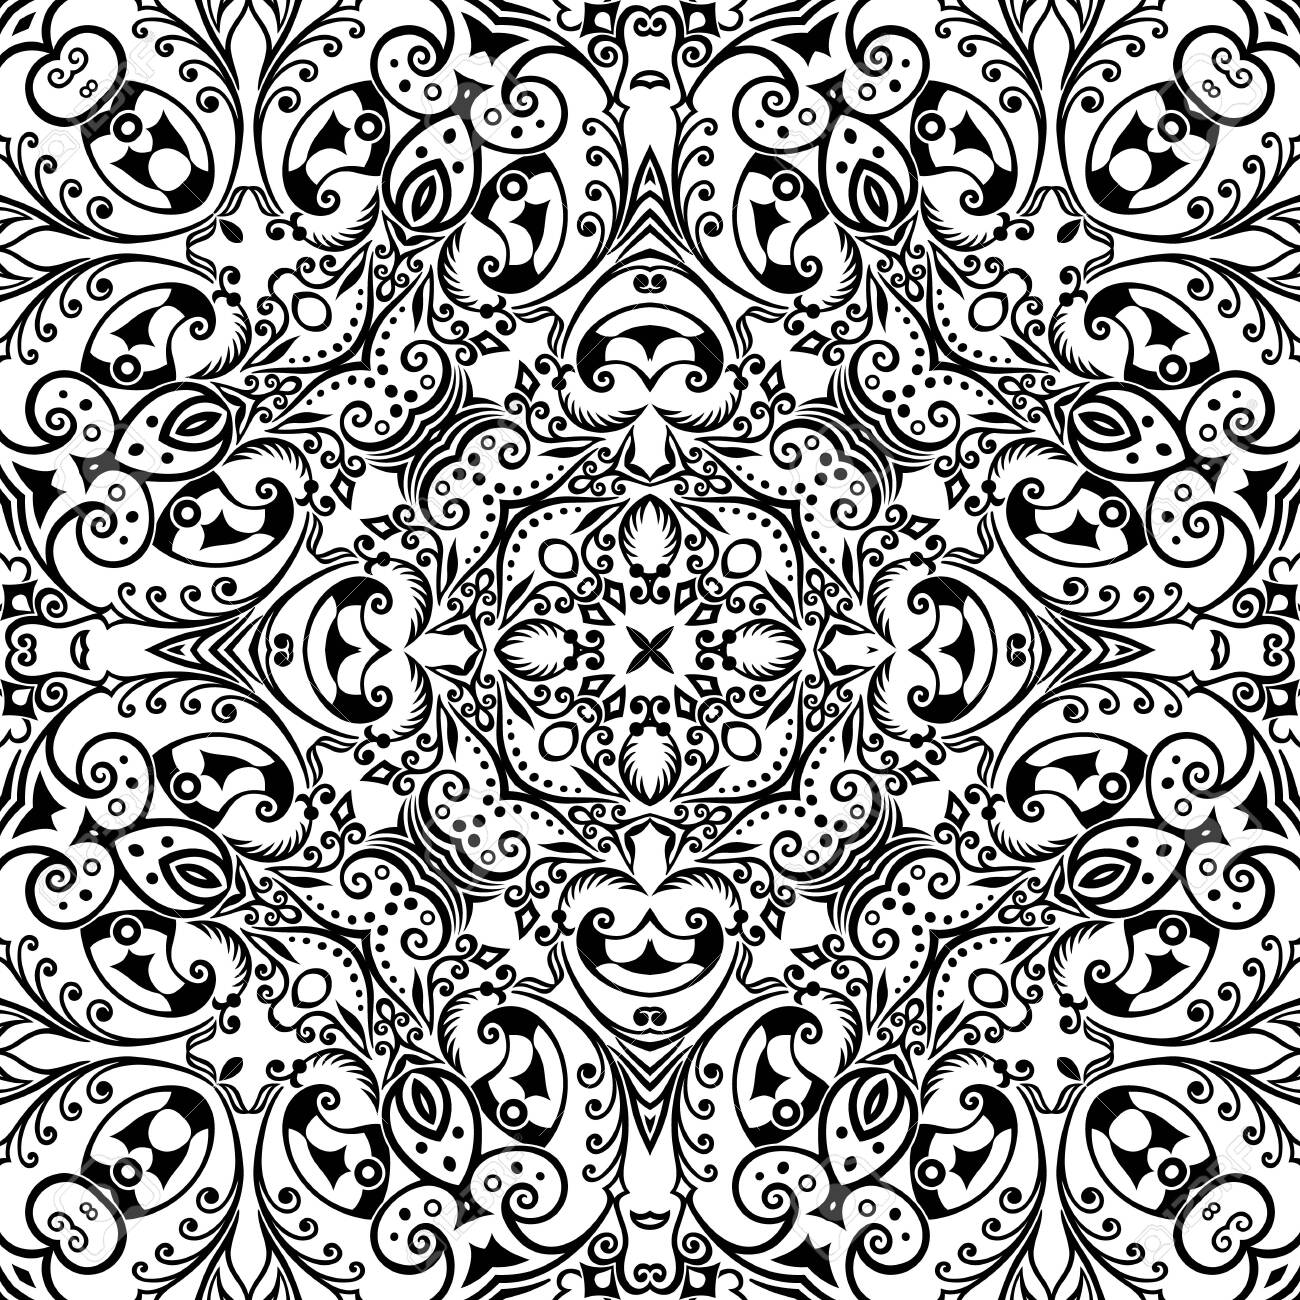 Vector ethnic hand drawn ornamental background. - 152225819